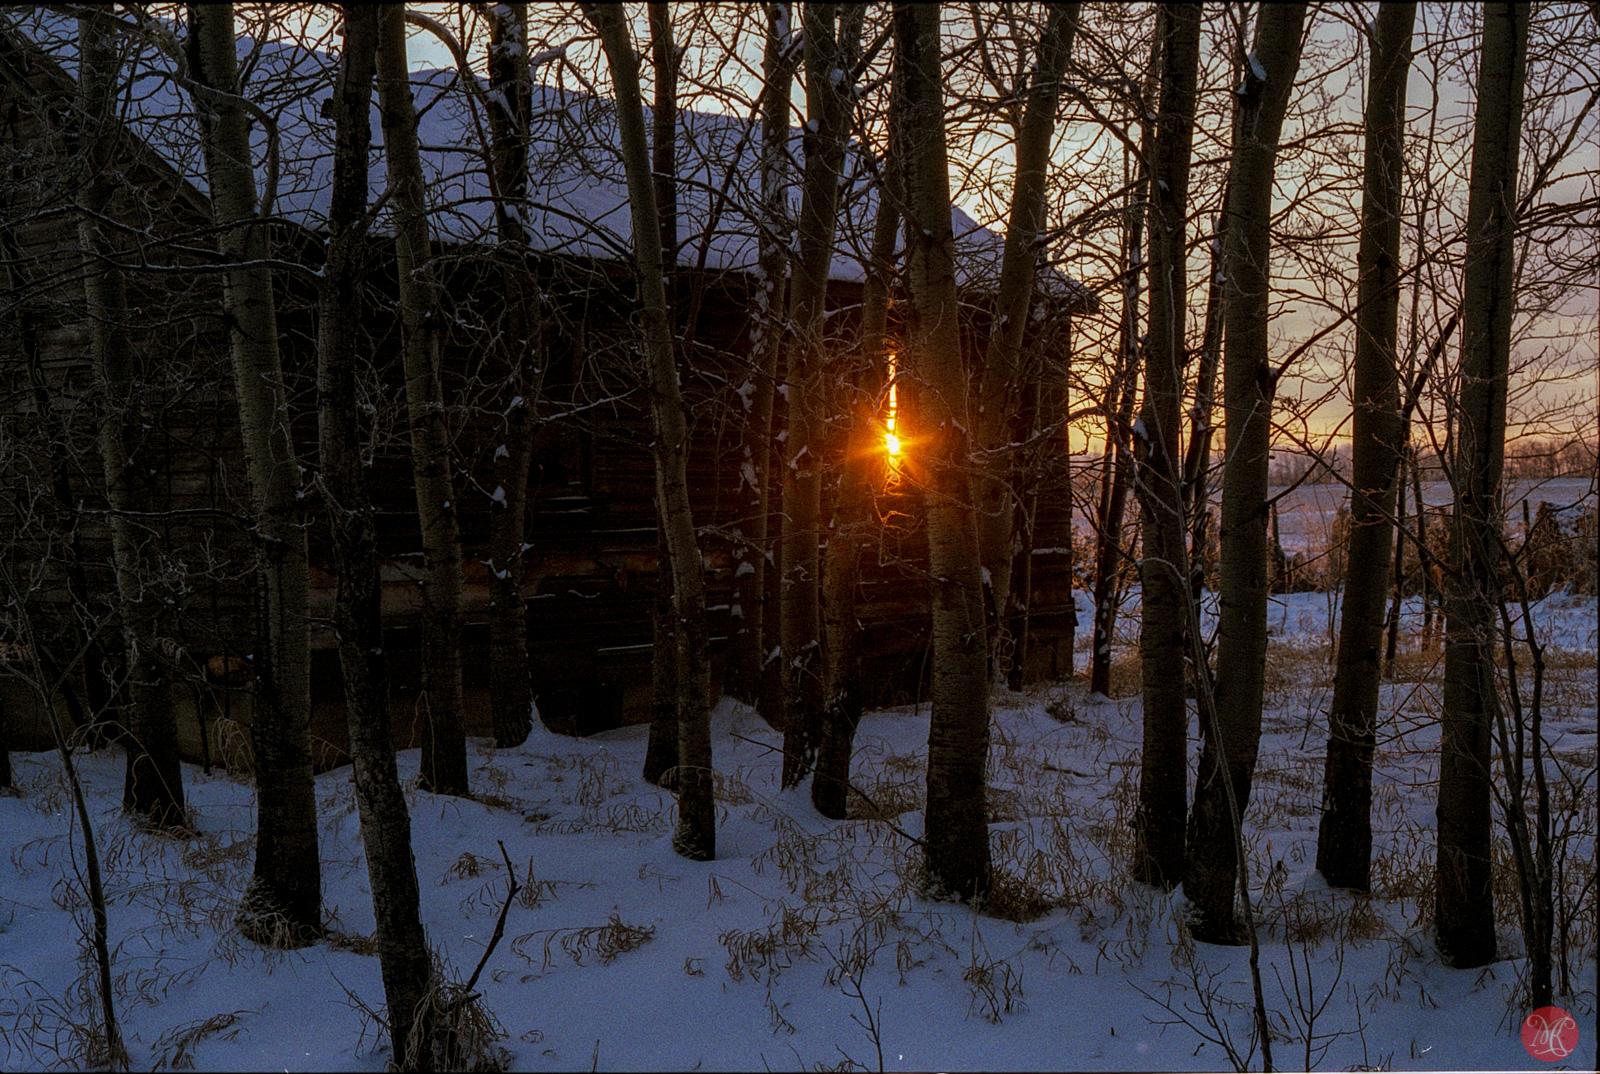 Sun peaking through a window in a abandoned house on Alberta prairies.